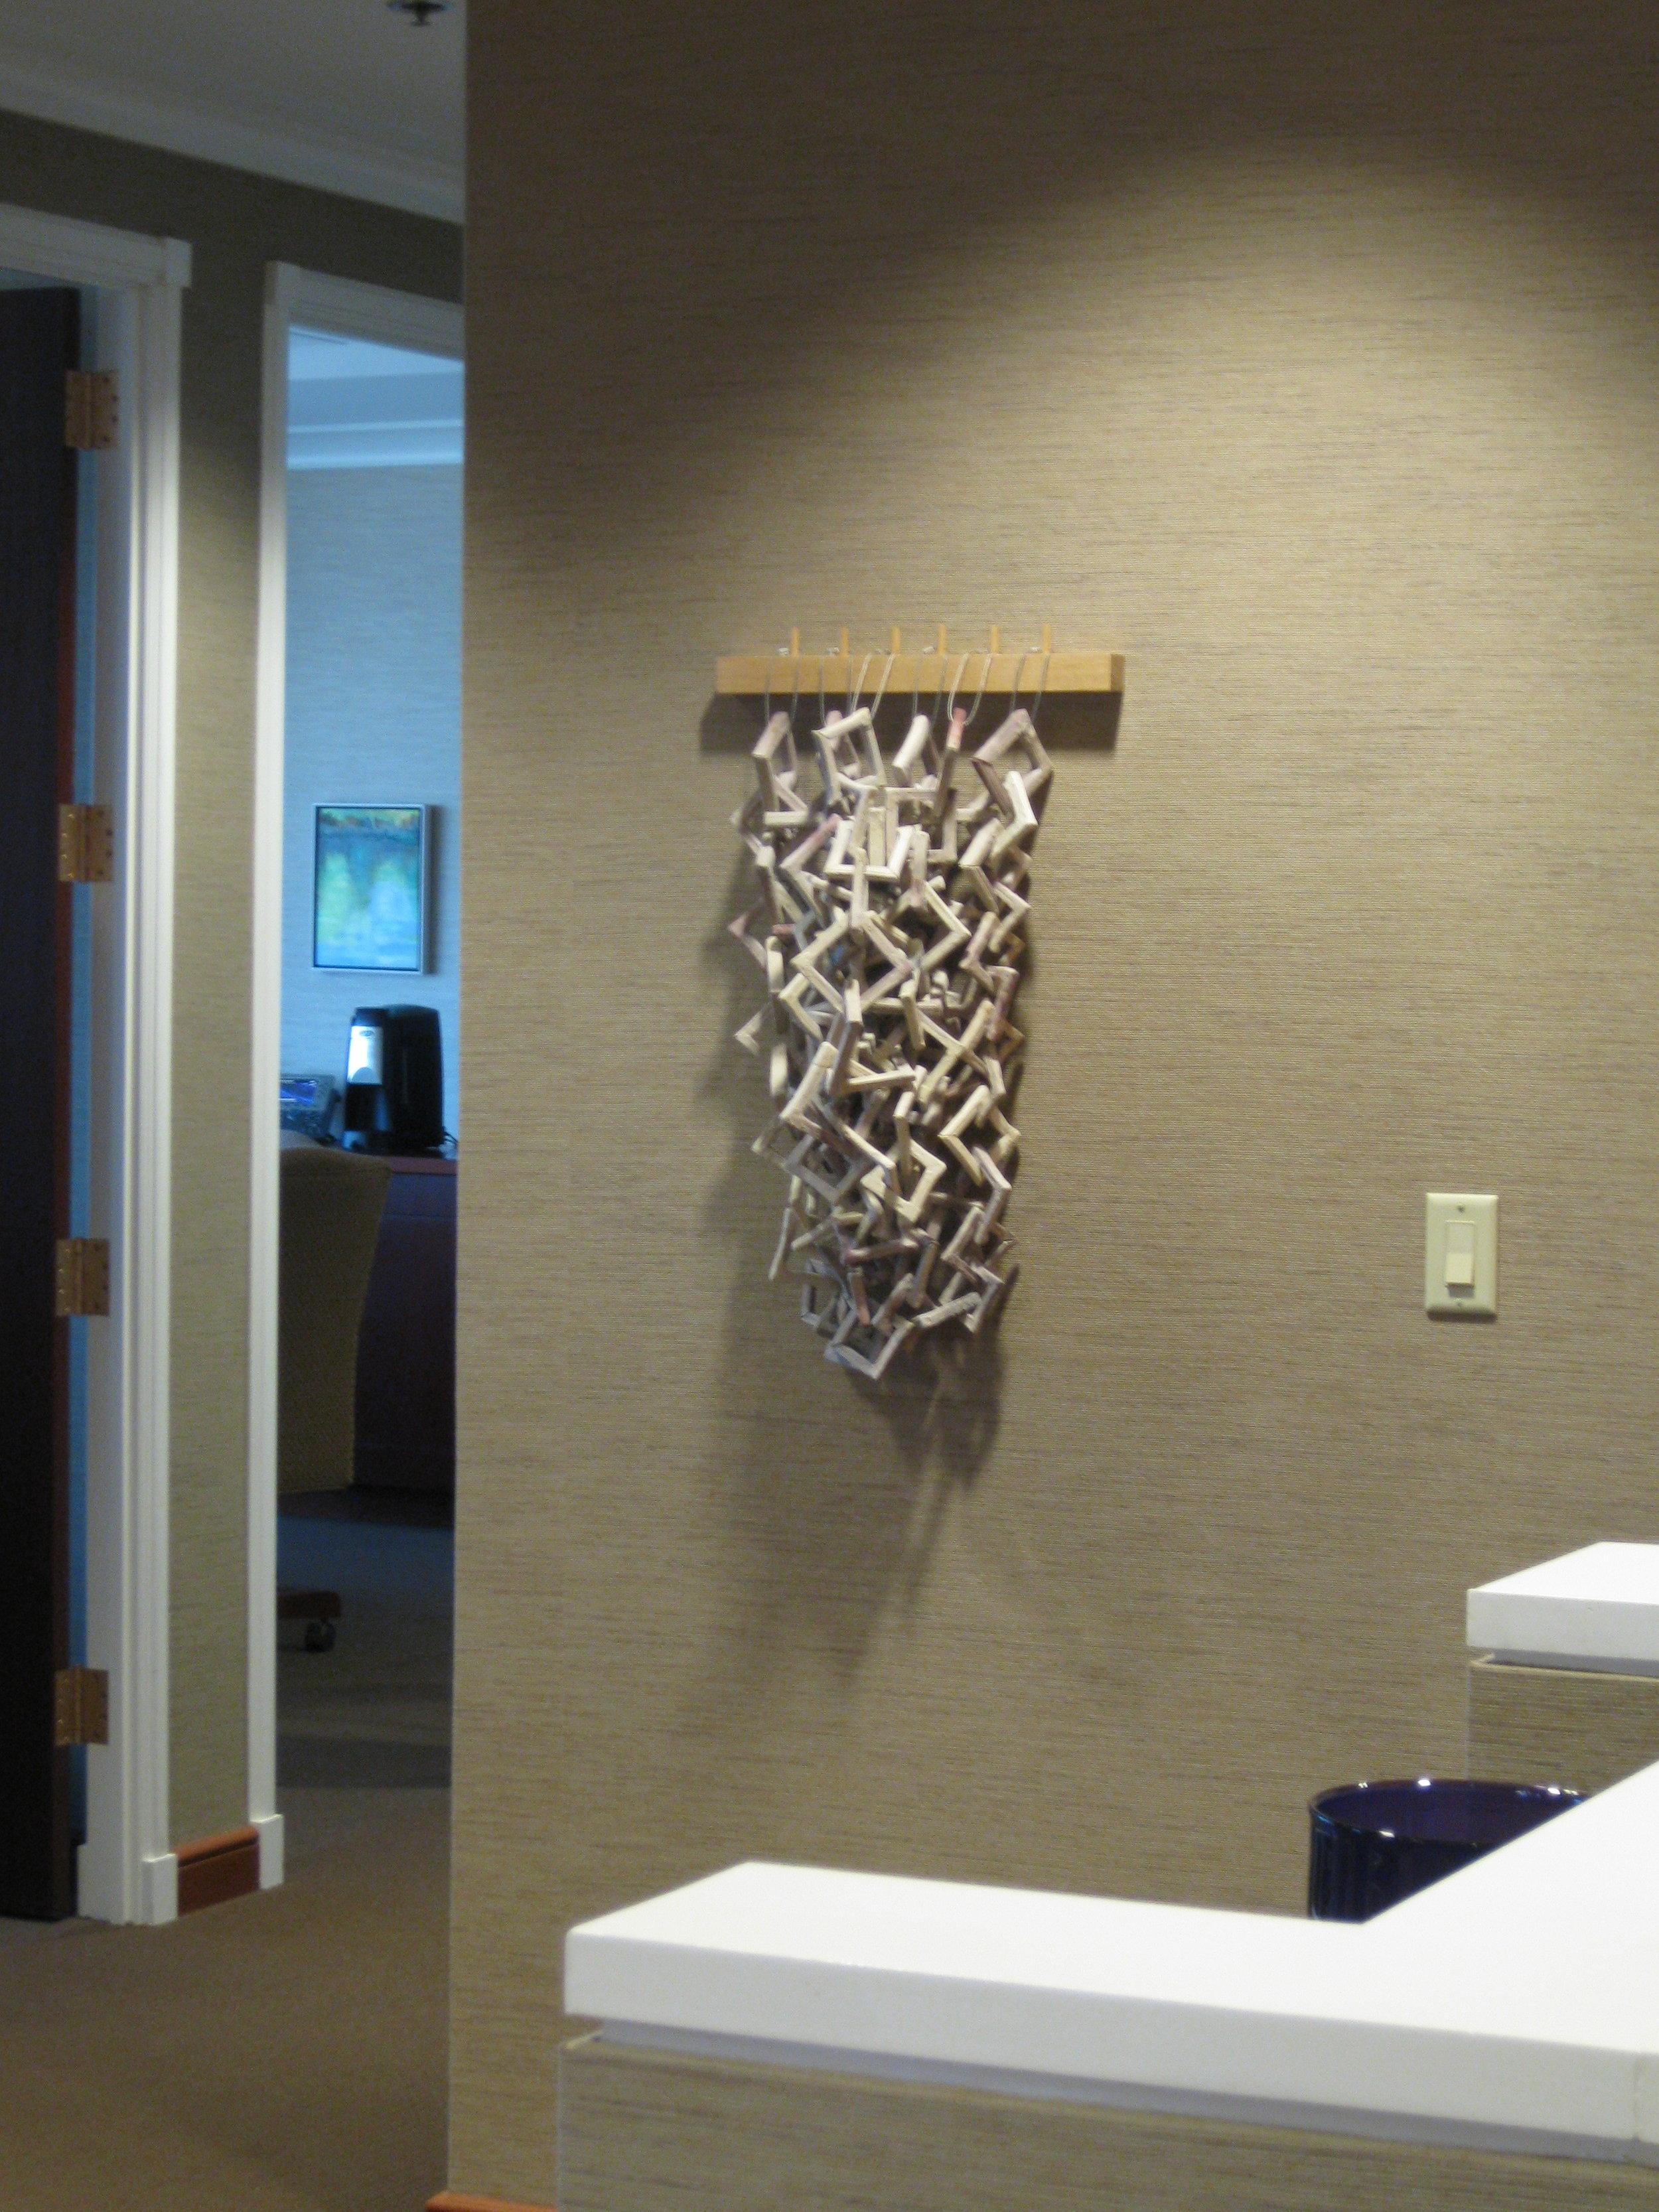 Emerging Artist selection by Maria Albornoz, concrete, wire & wood